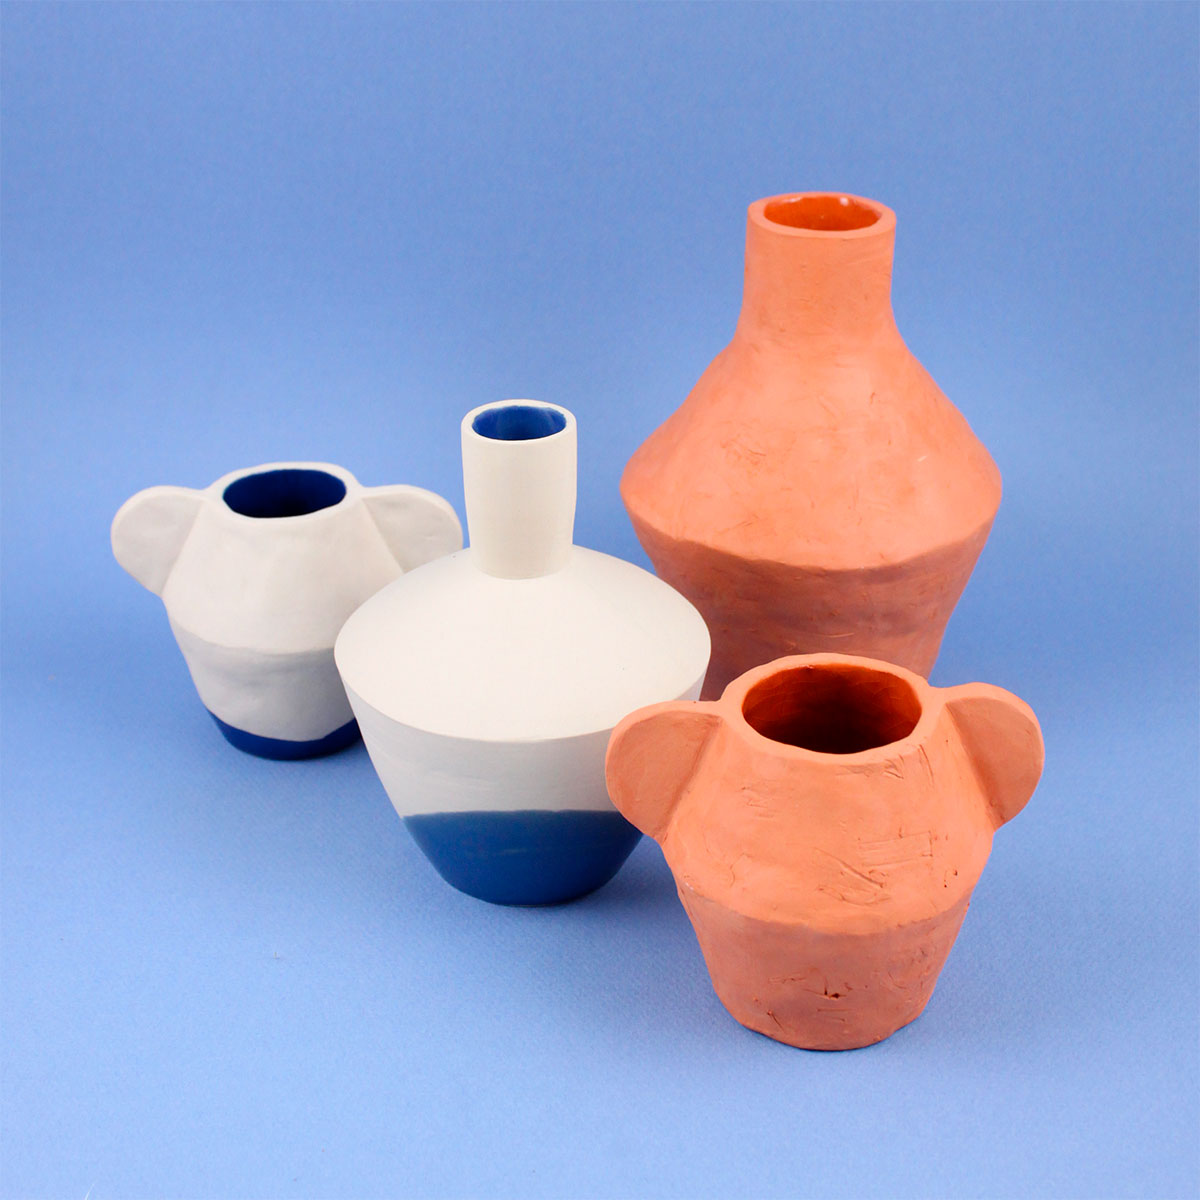 Cassandre Bouilly artwork gallery pot planter vase clay ceramics Cool Machine store